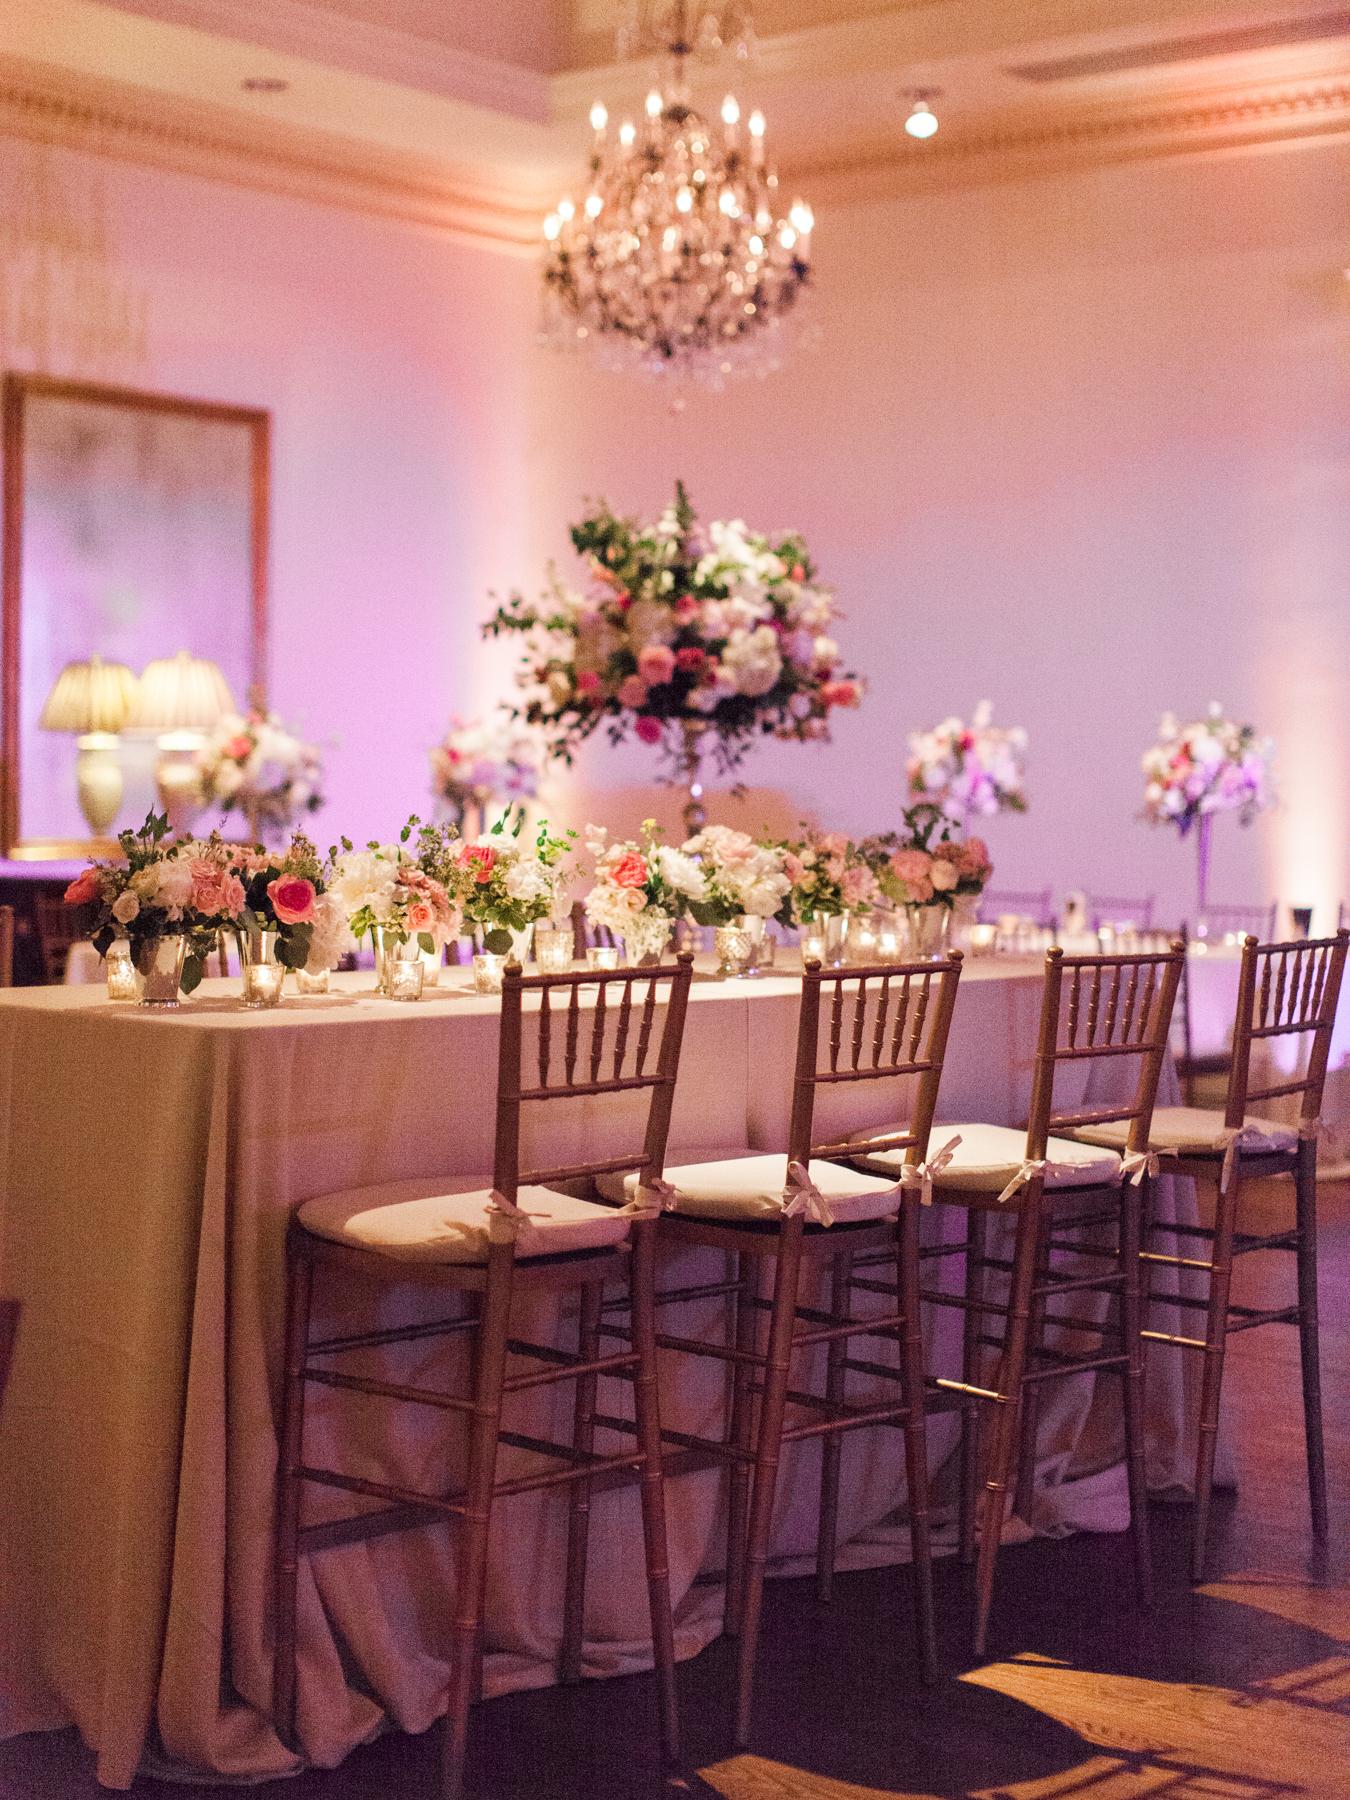 Charlotte Wedding Themes & Ideas | PartySlate